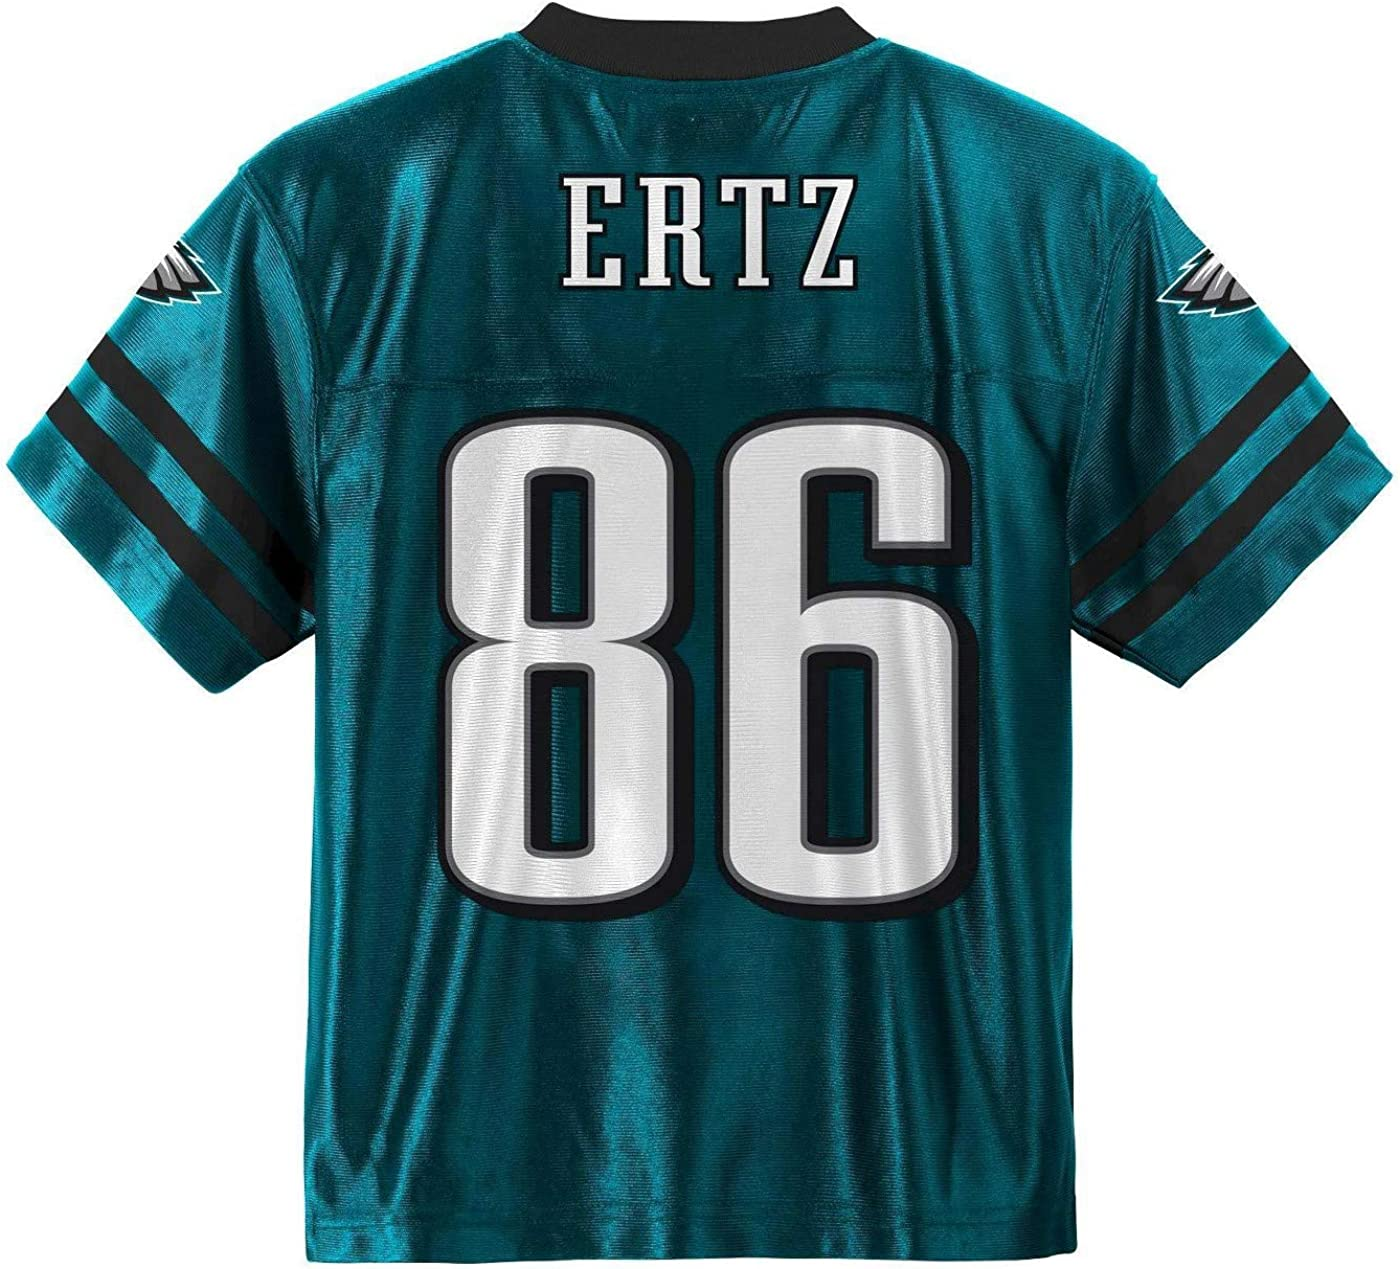 Zach Ertz Philadelphia Eagles #86 Green Youth Name /& Number Jersey T-Shirt